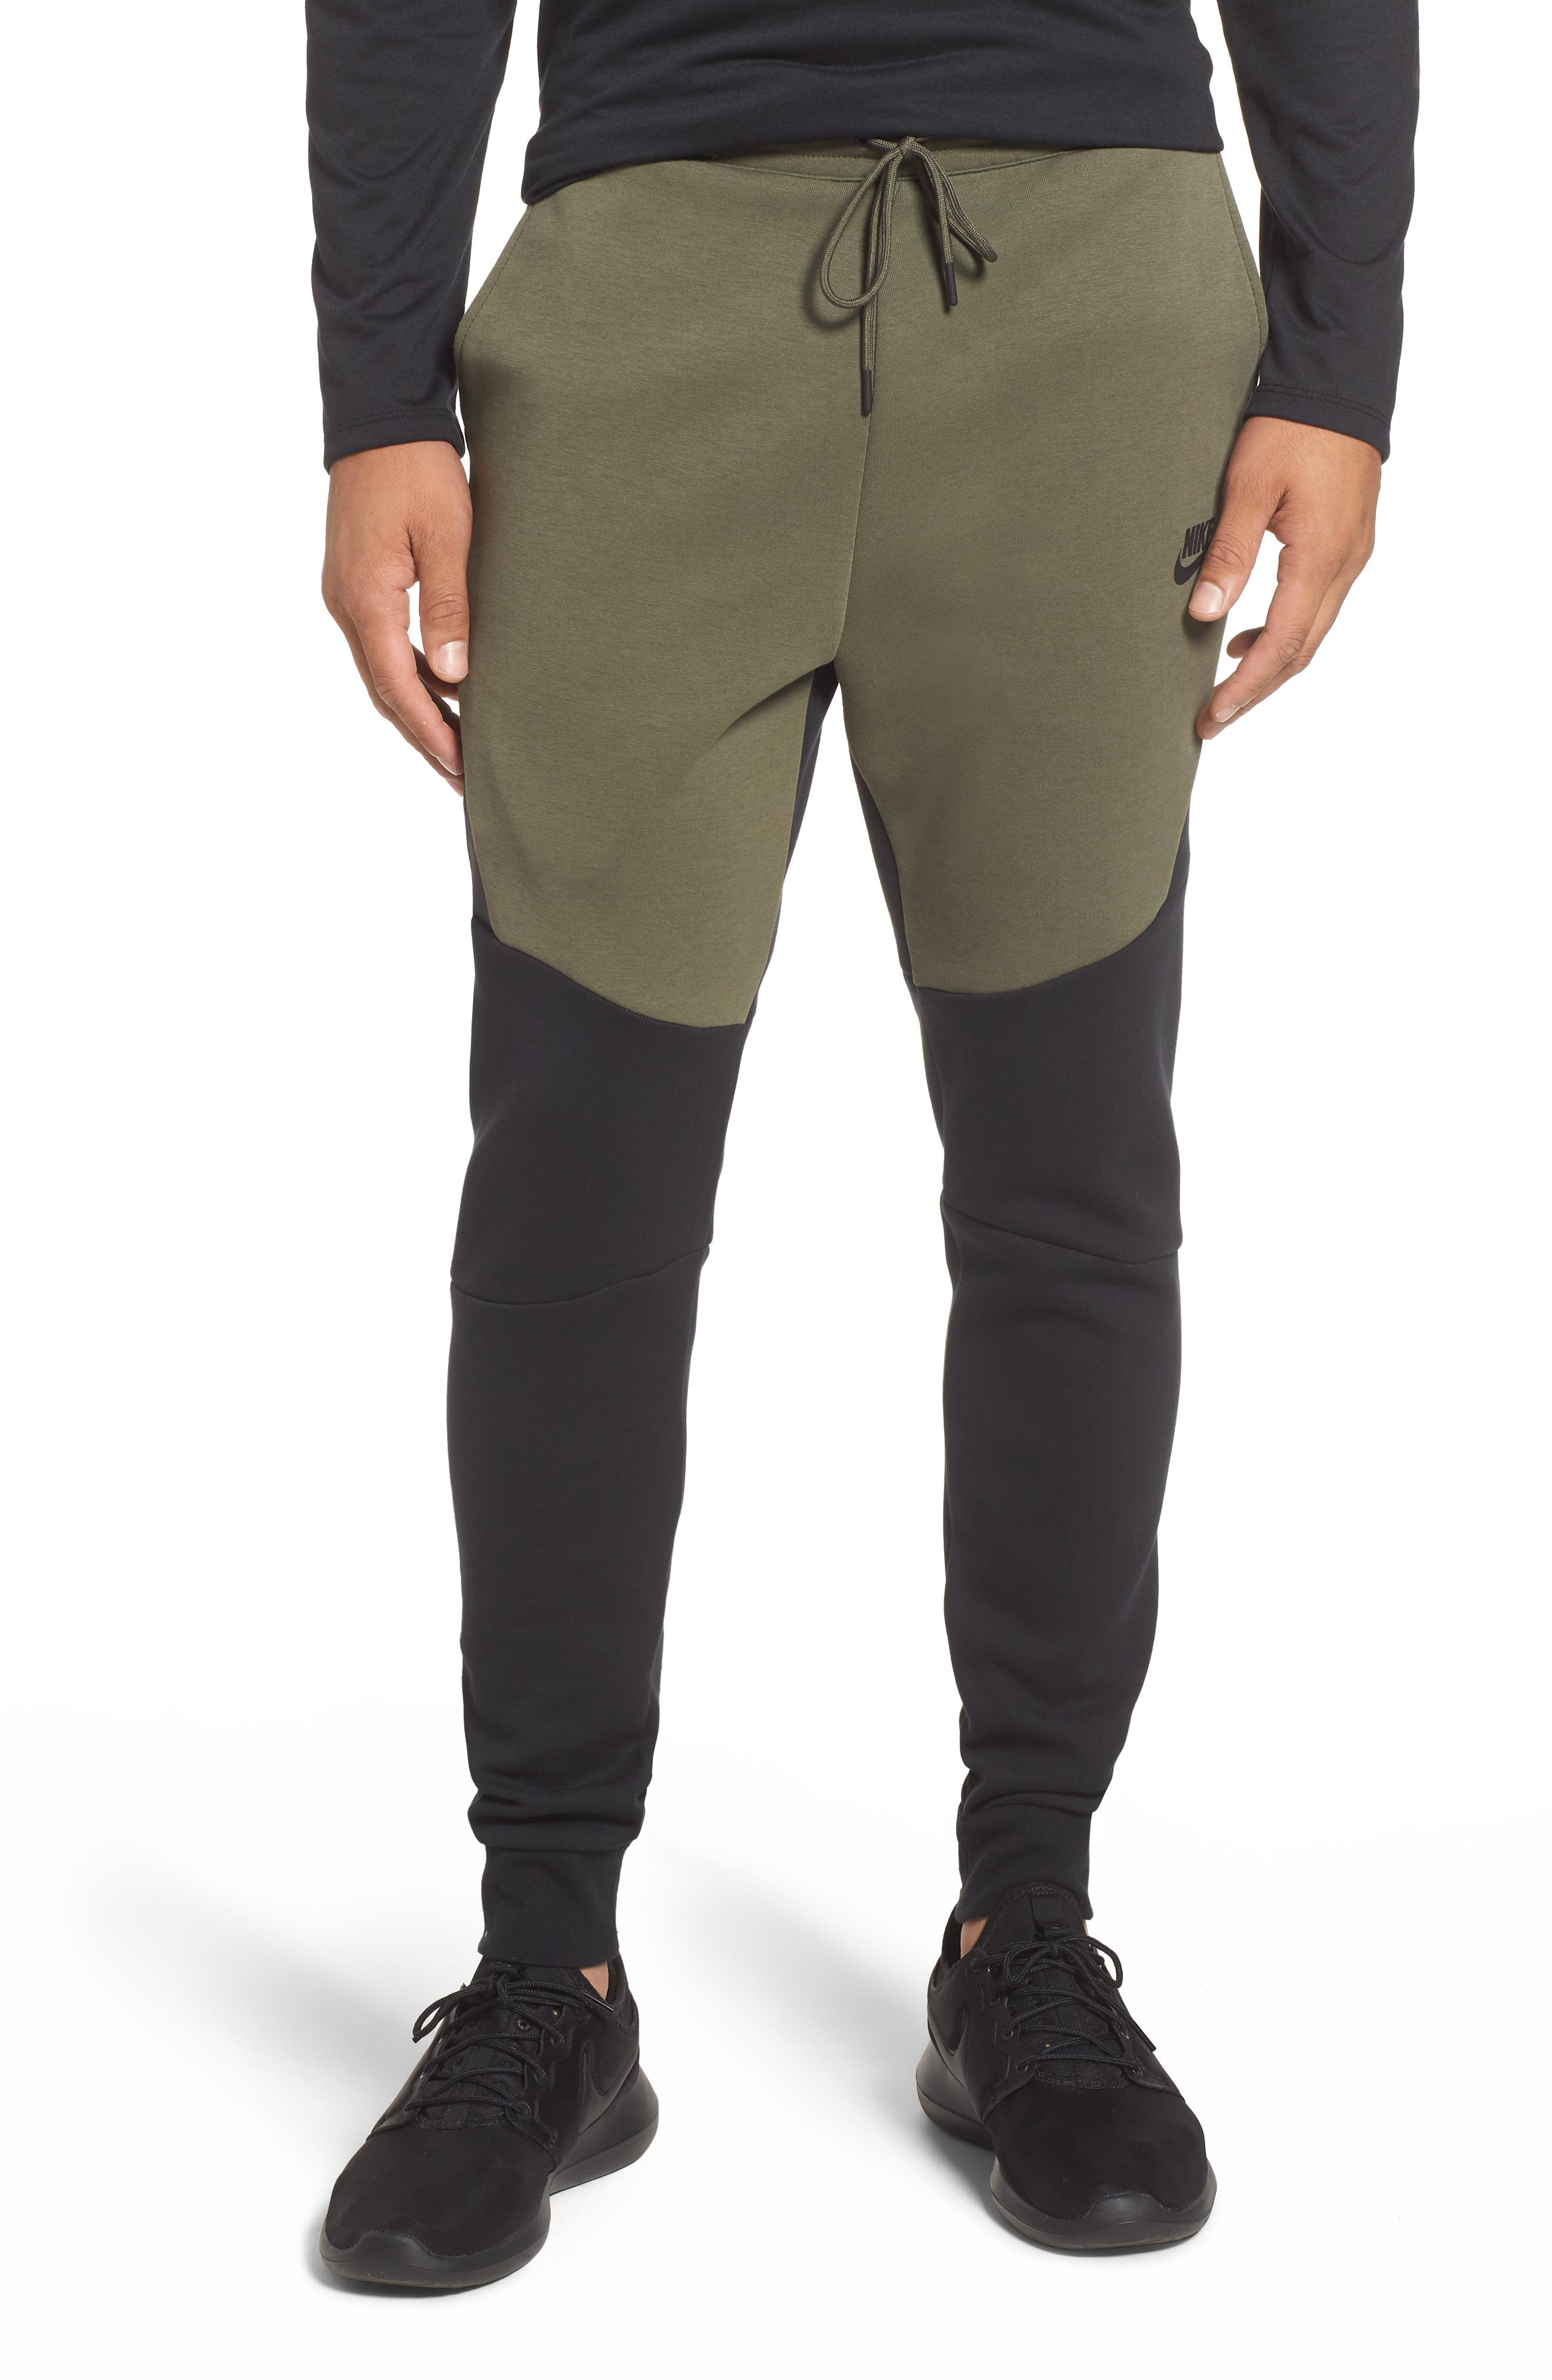 Tech Fleece Jogger Pants,                         Main,                         color, BLACK/ TWILIGHT MARSH/ BLACK